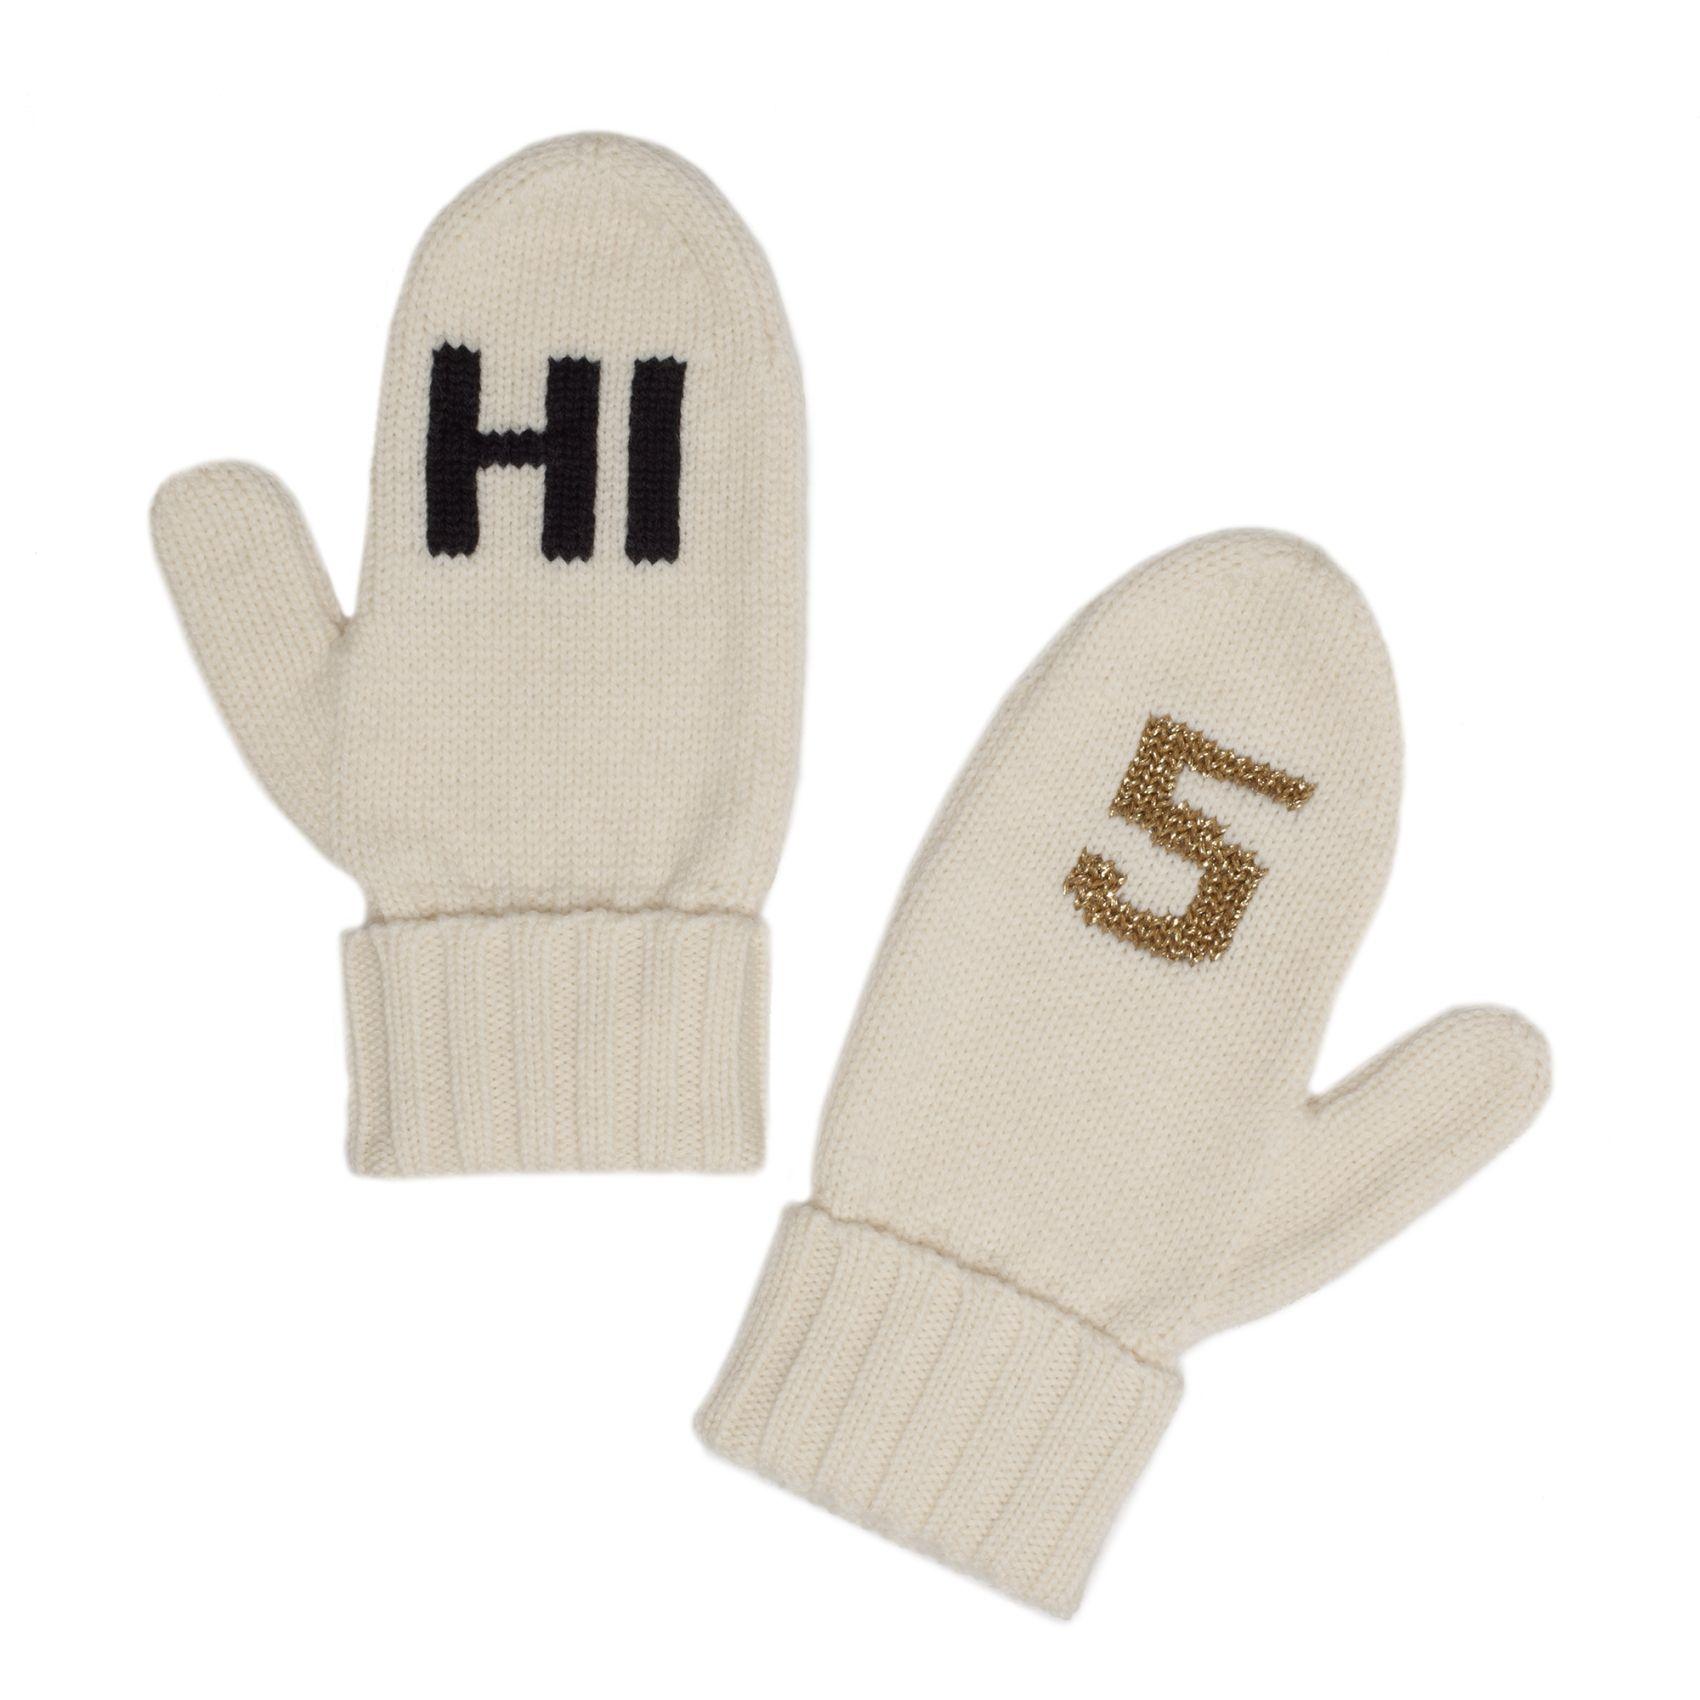 Say Hi! Gimme 5!